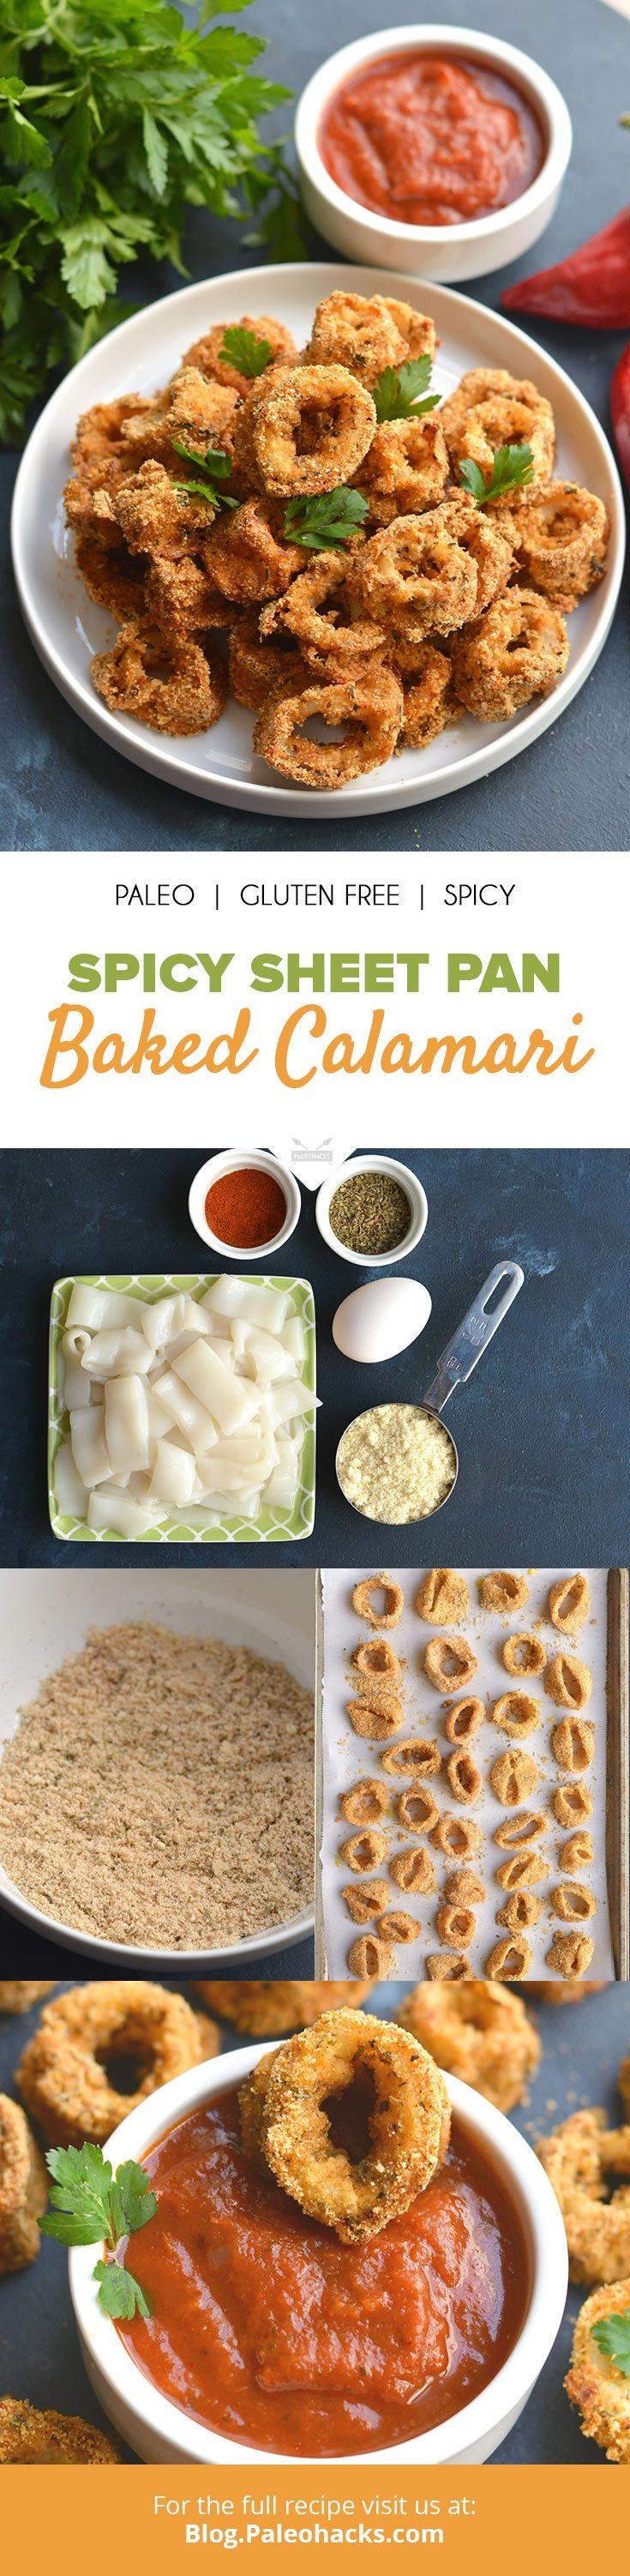 Spicy Sheet Pan Baked Calamari Recipe Calamari recipes